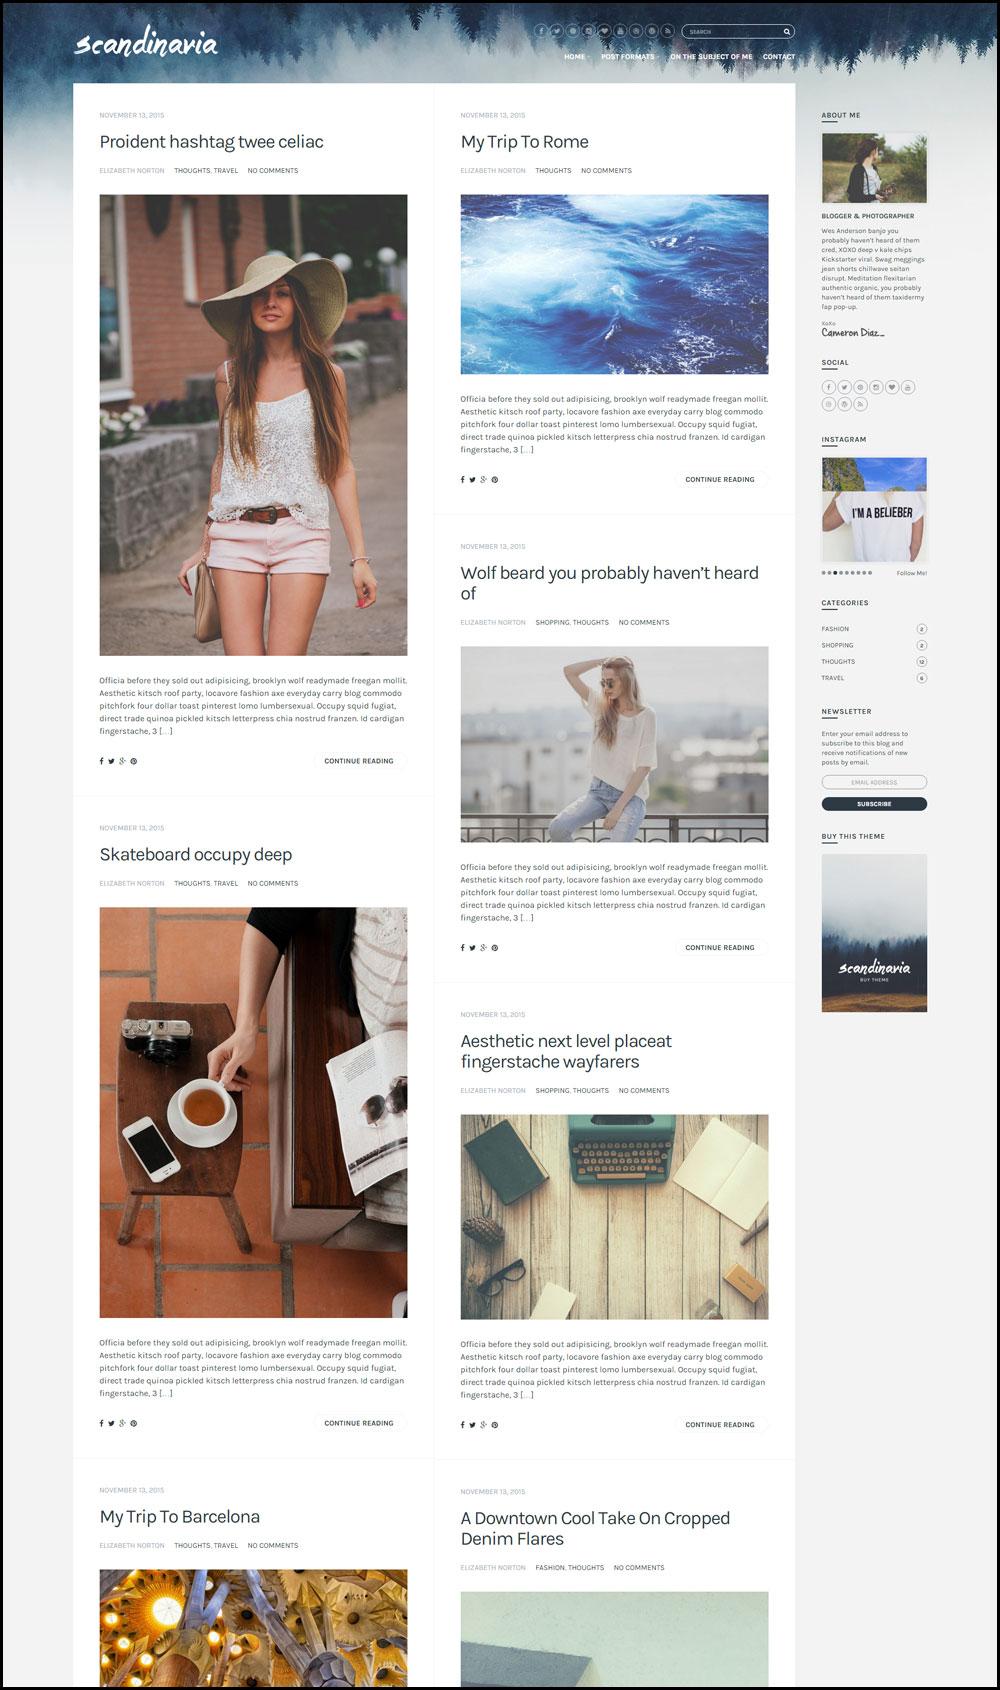 Scandinavia – A Stylish WordPess Theme For Successful Travel Blog